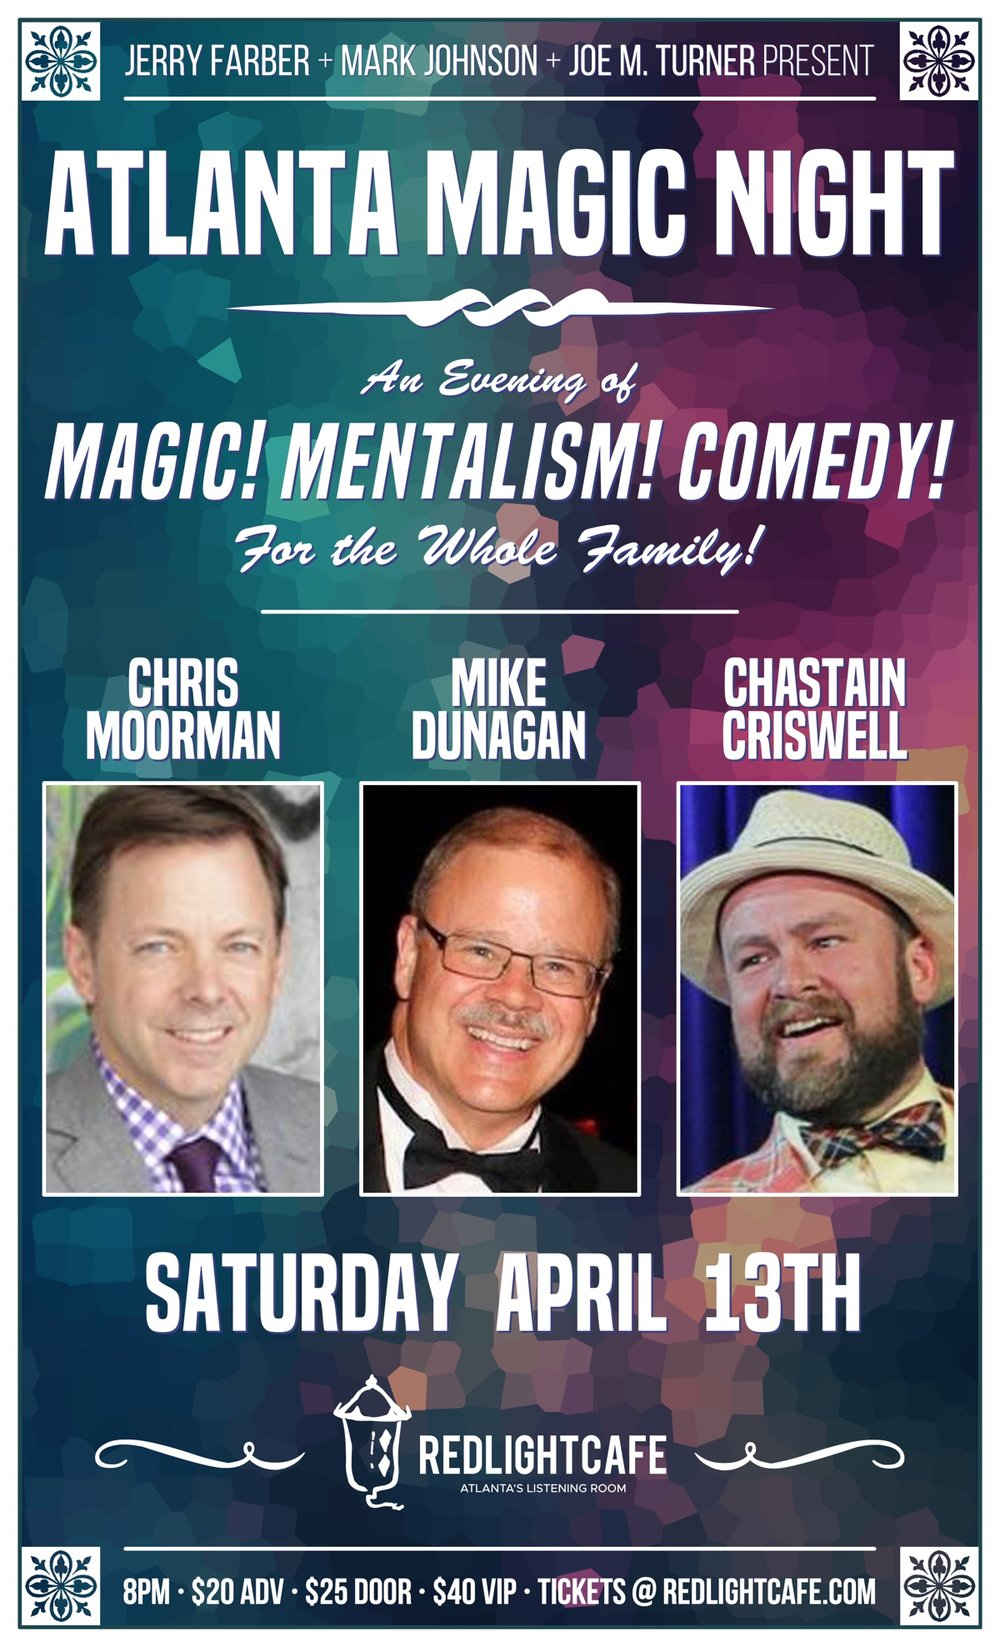 Atlanta Magic Night! w/ Chris Moorman + Mike Dunagan + Chastain Criswell — April 13, 2019 — Red Light Café, Atlanta, GA